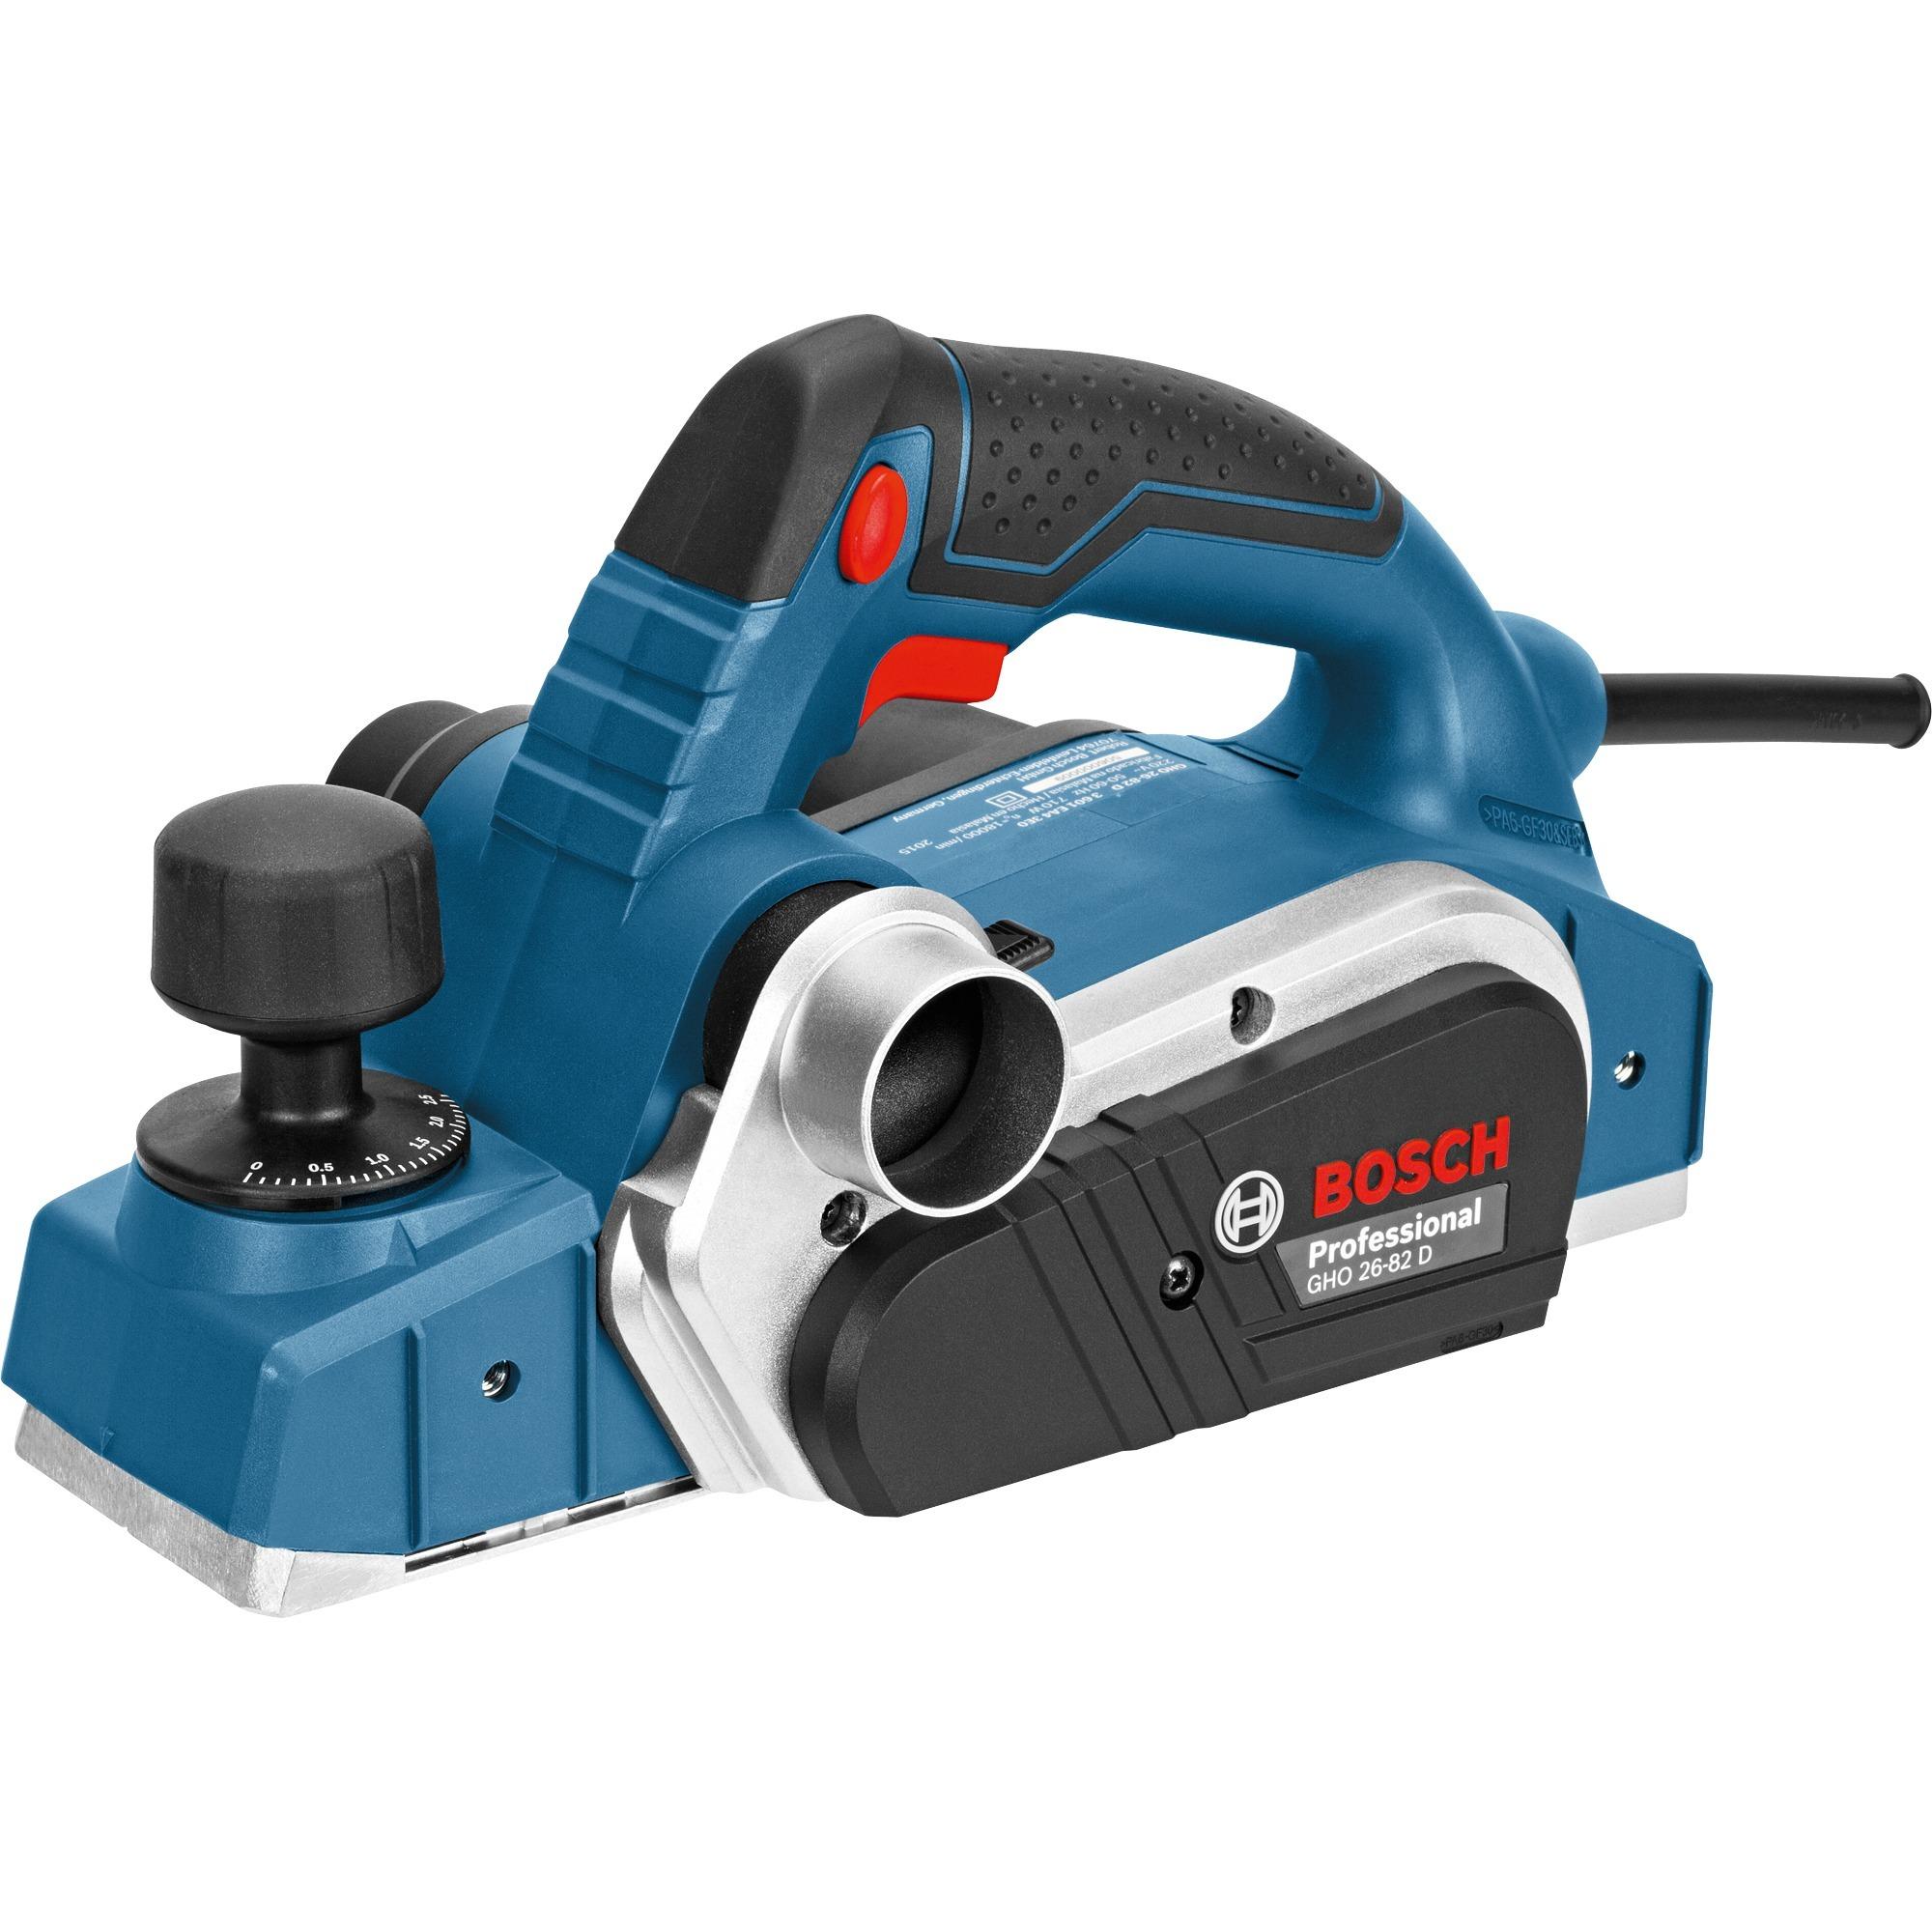 GHO 26-82 D Professional cepilladora eléctrica 710 W 18000 RPM Negro, Azul, Plata, Cepillo eléctrico